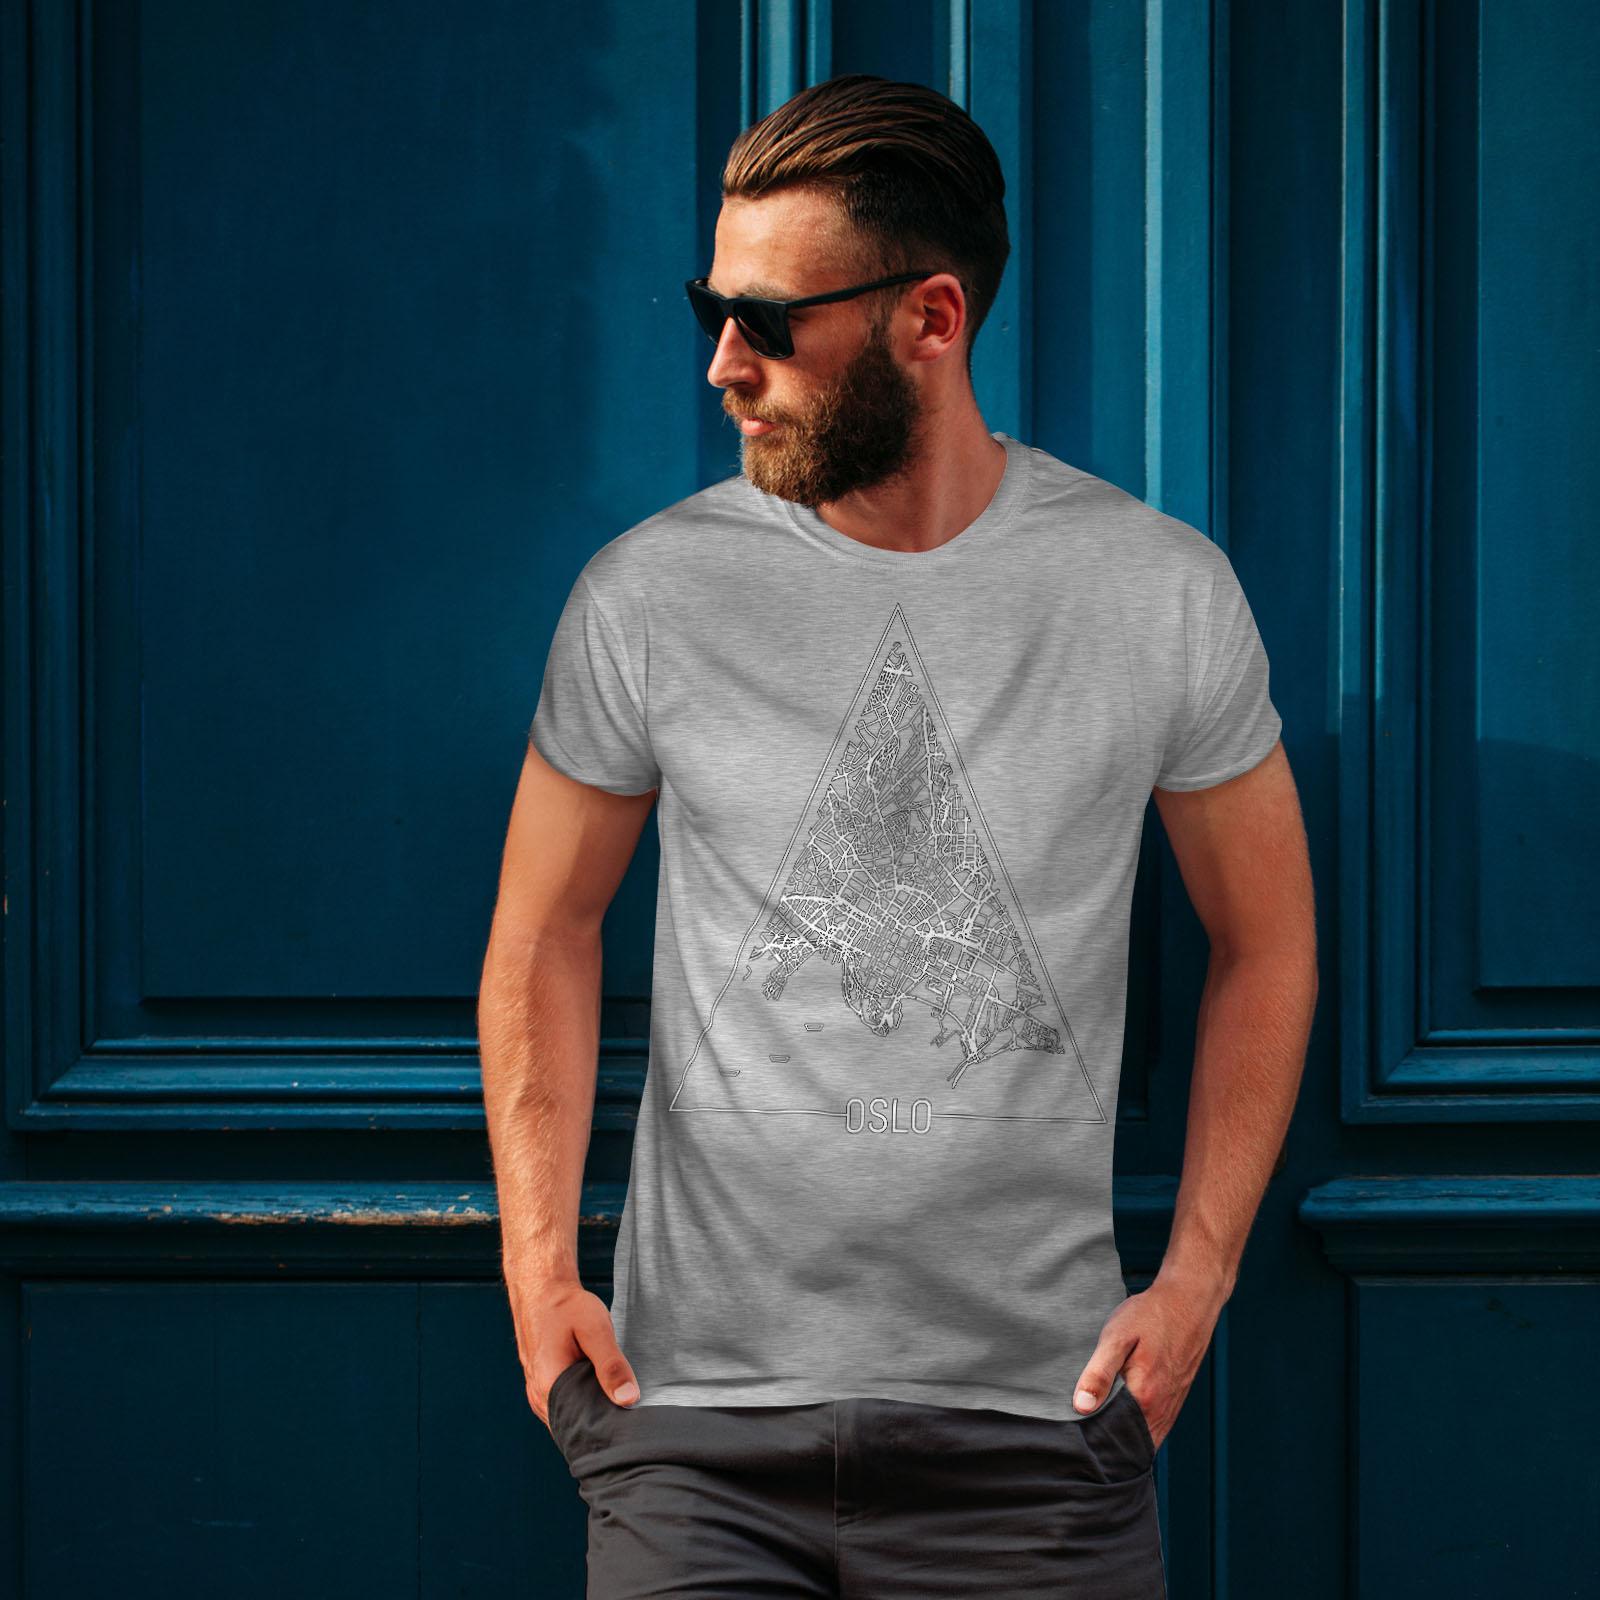 Wellcoda-Norvegia-Big-City-Oslo-da-uomo-T-shirt-Citta-design-grafico-stampato-T-shirt miniatura 16